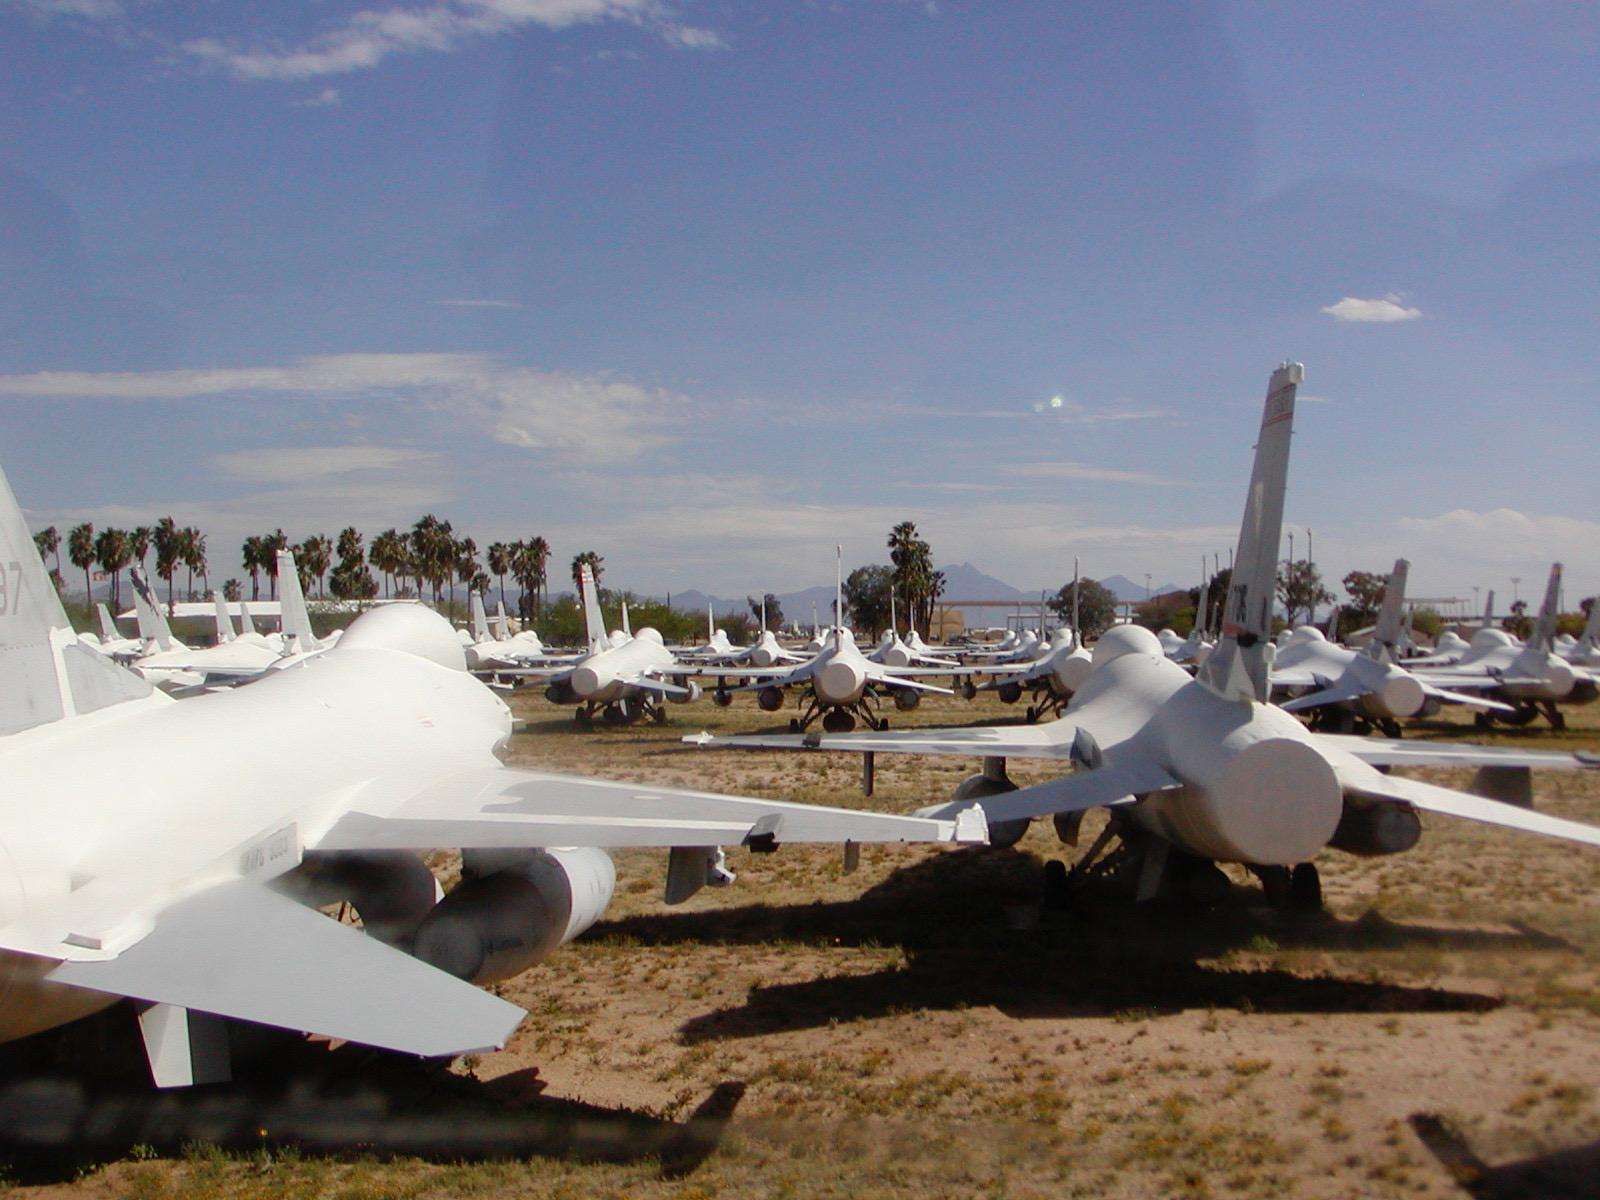 F-16s at the 309 AMARC Boneyard